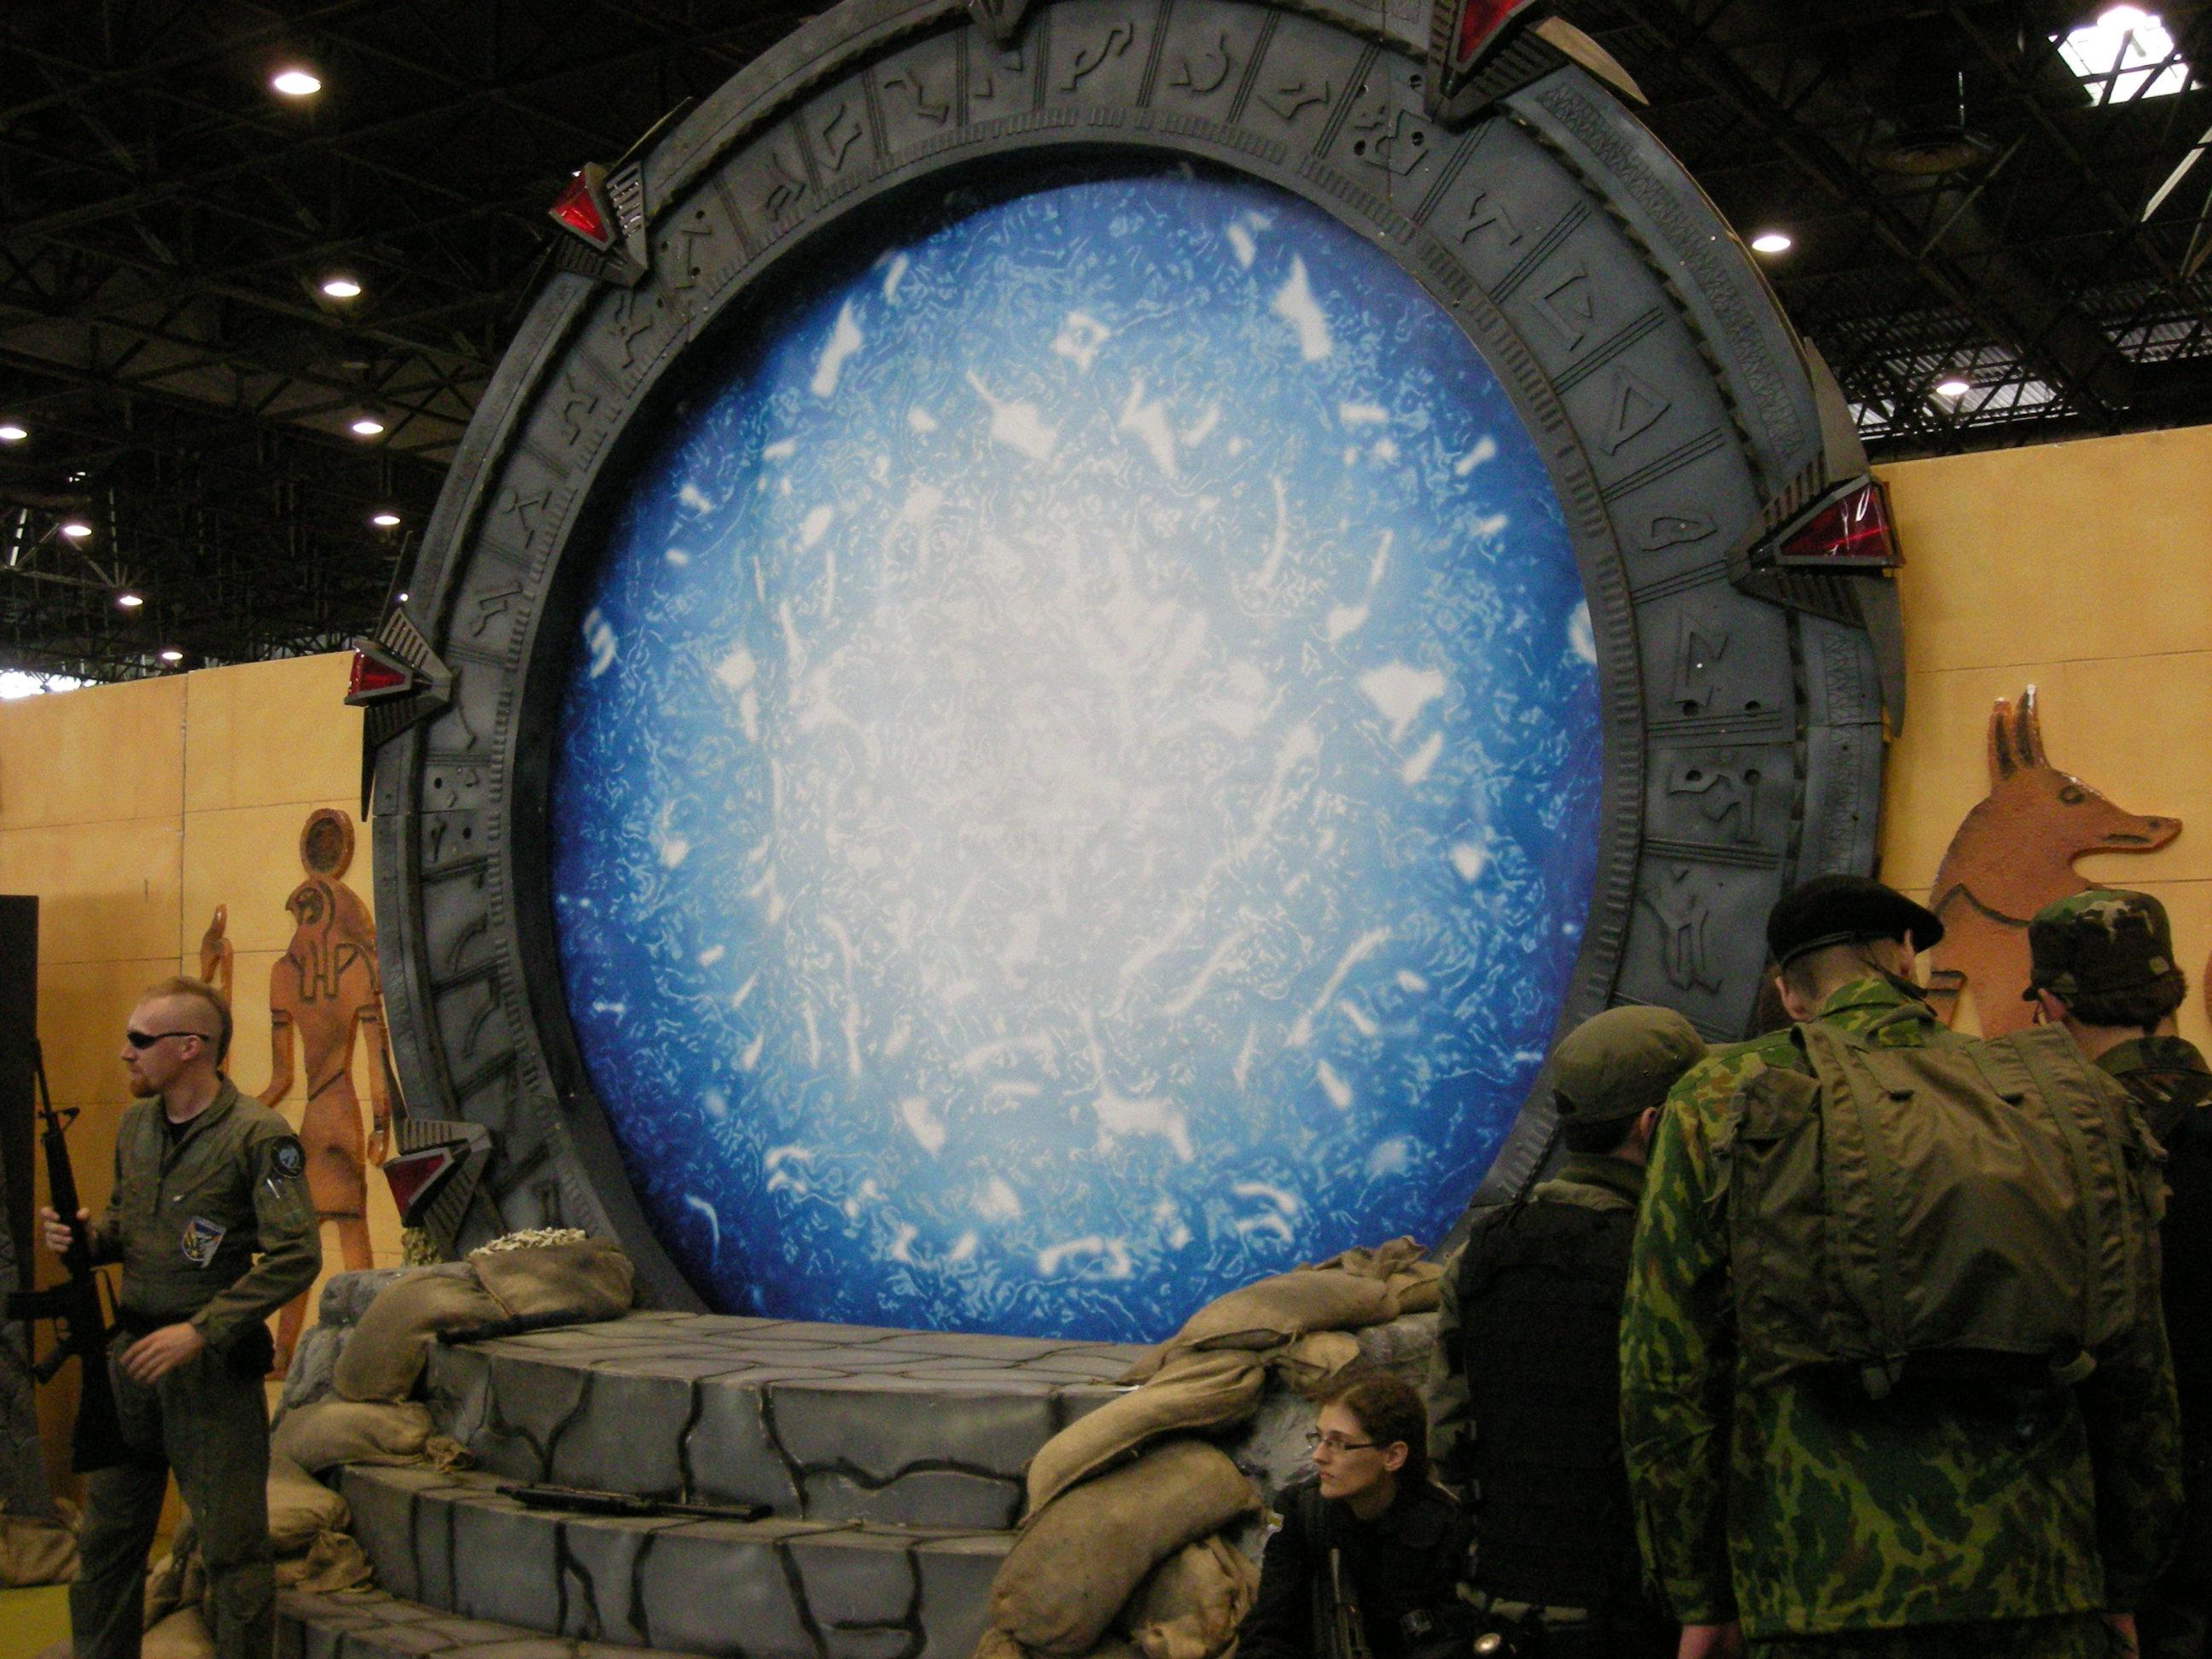 Stargate Película Wikipedia La Enciclopedia Libre